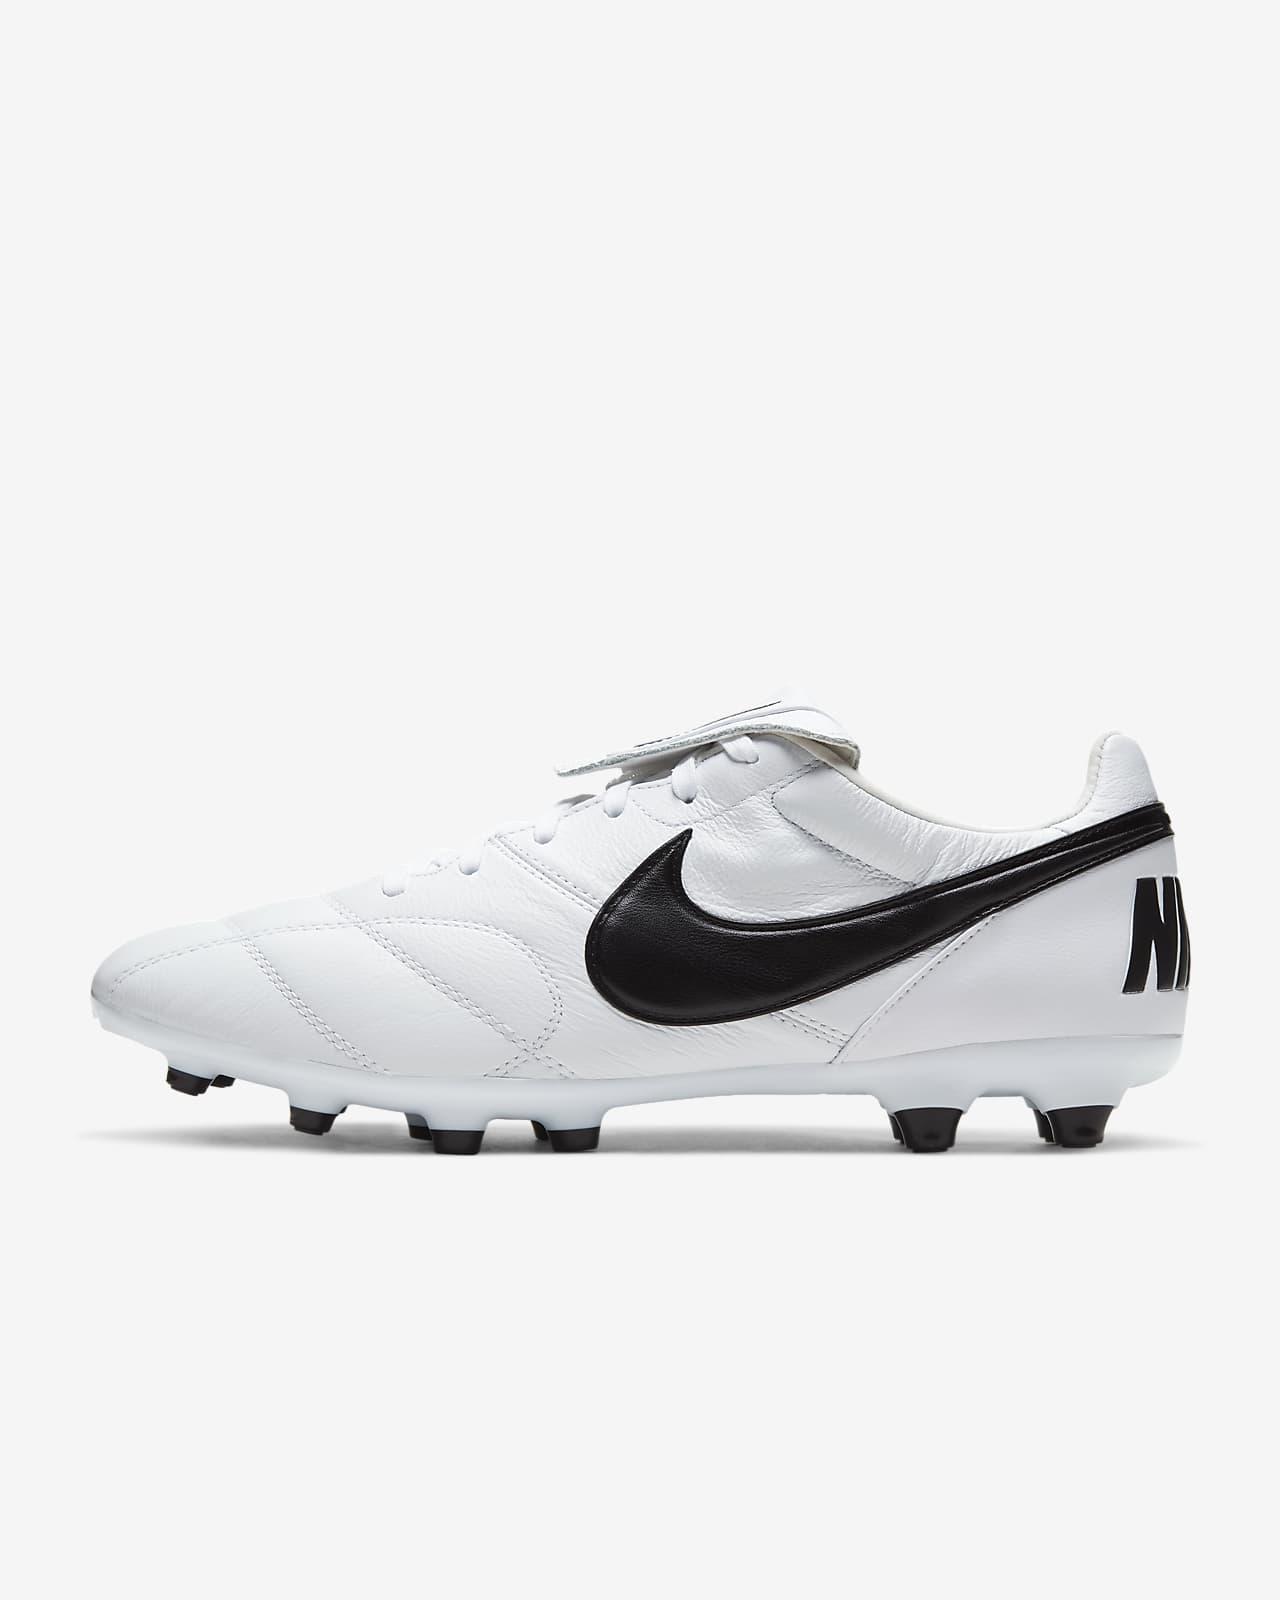 Nike Premier II FG Firm-Ground Football